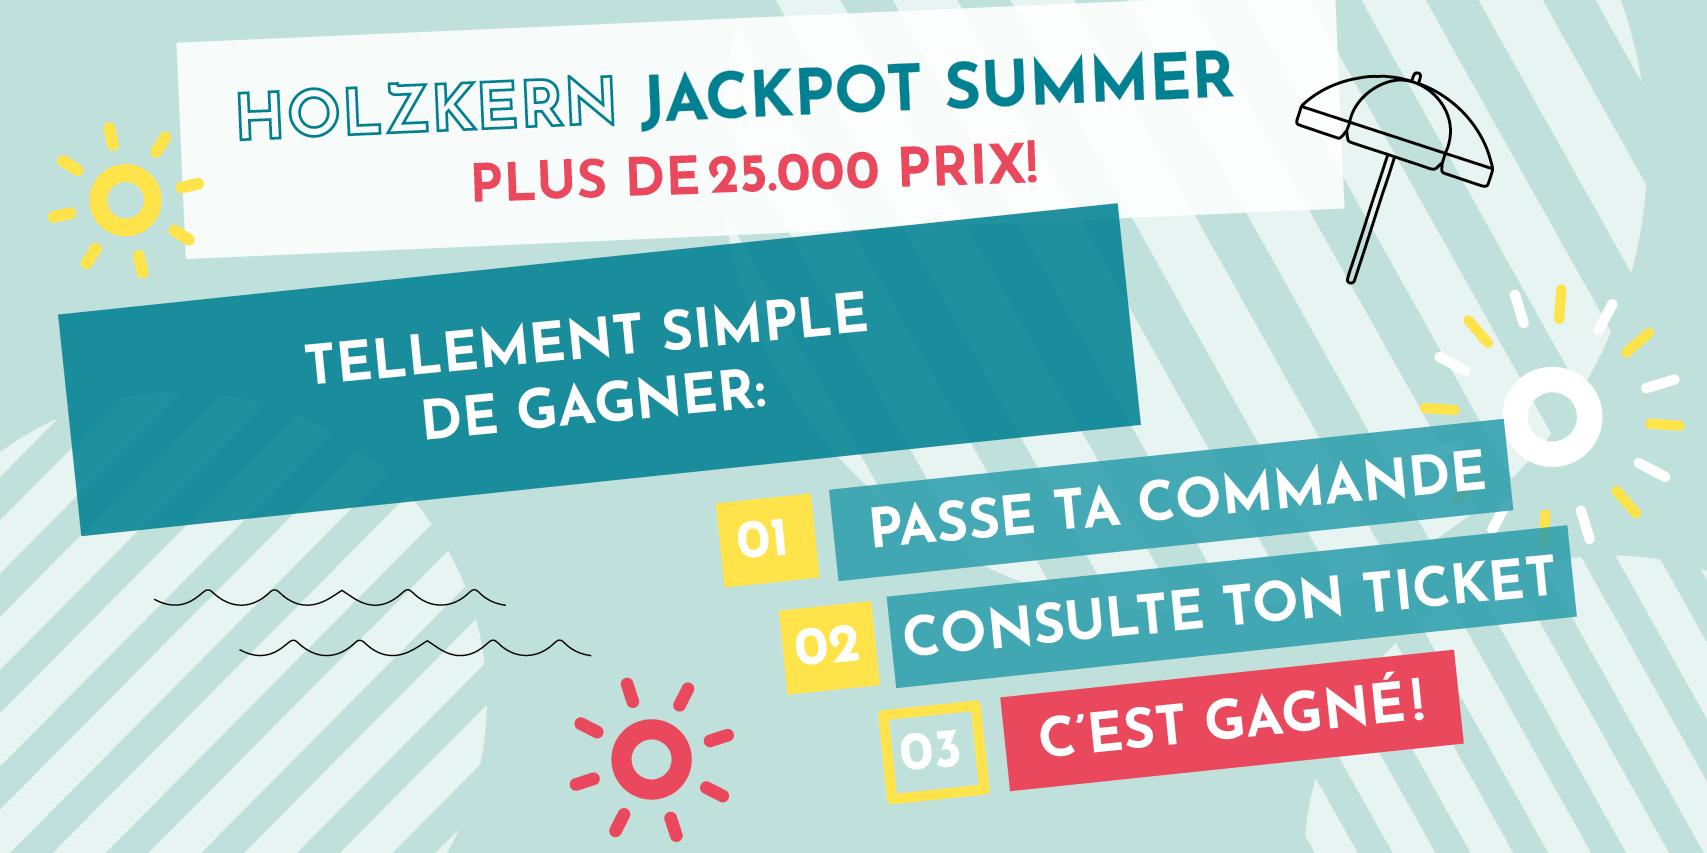 Holzkern Jackpot Summer